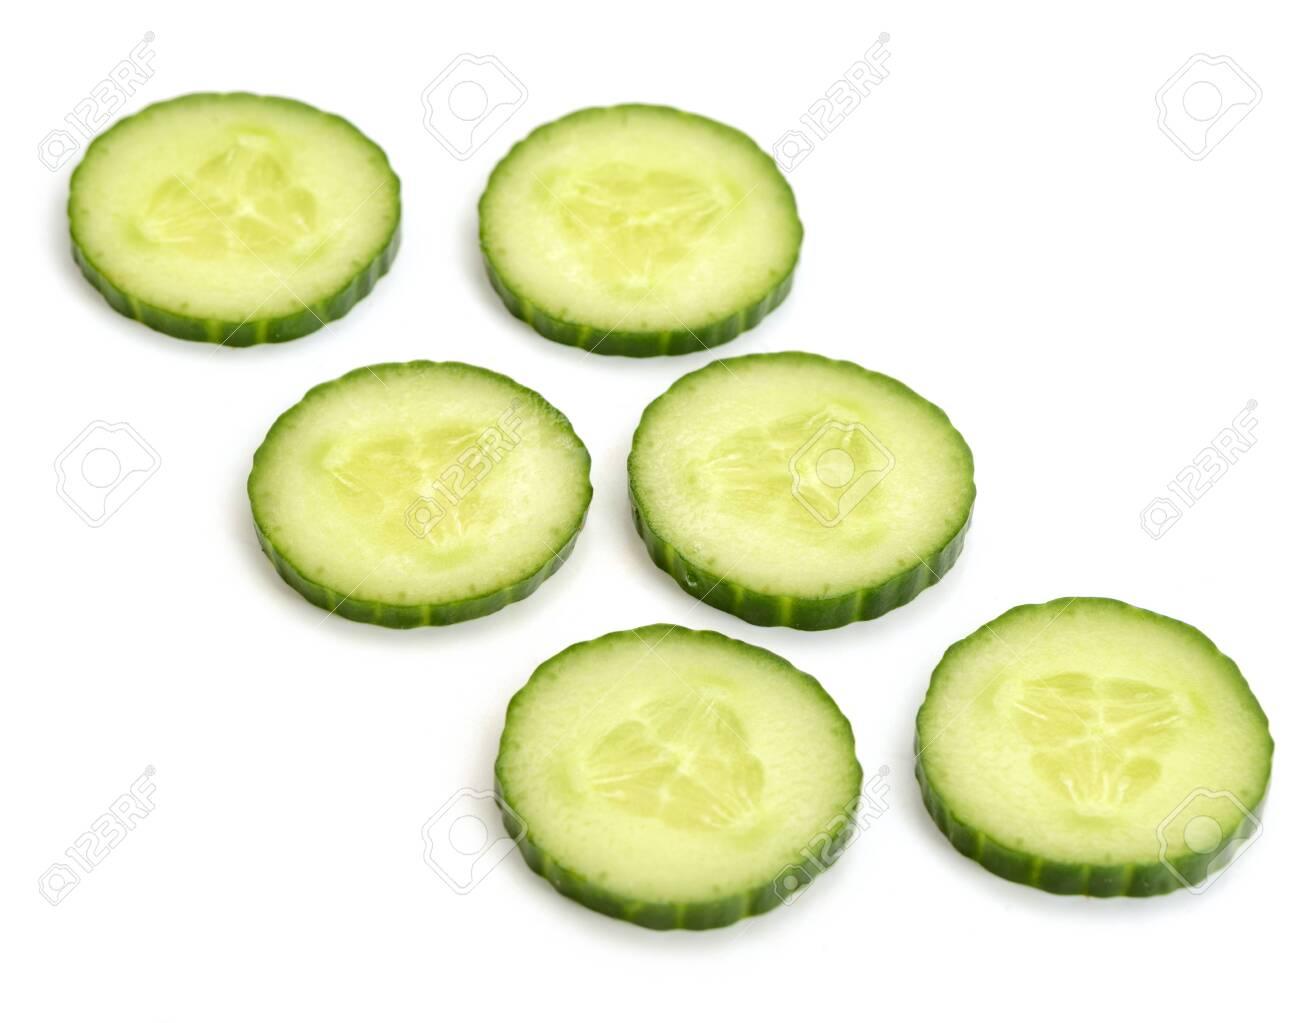 Fresh cucumber circle slices on white background - 142420214